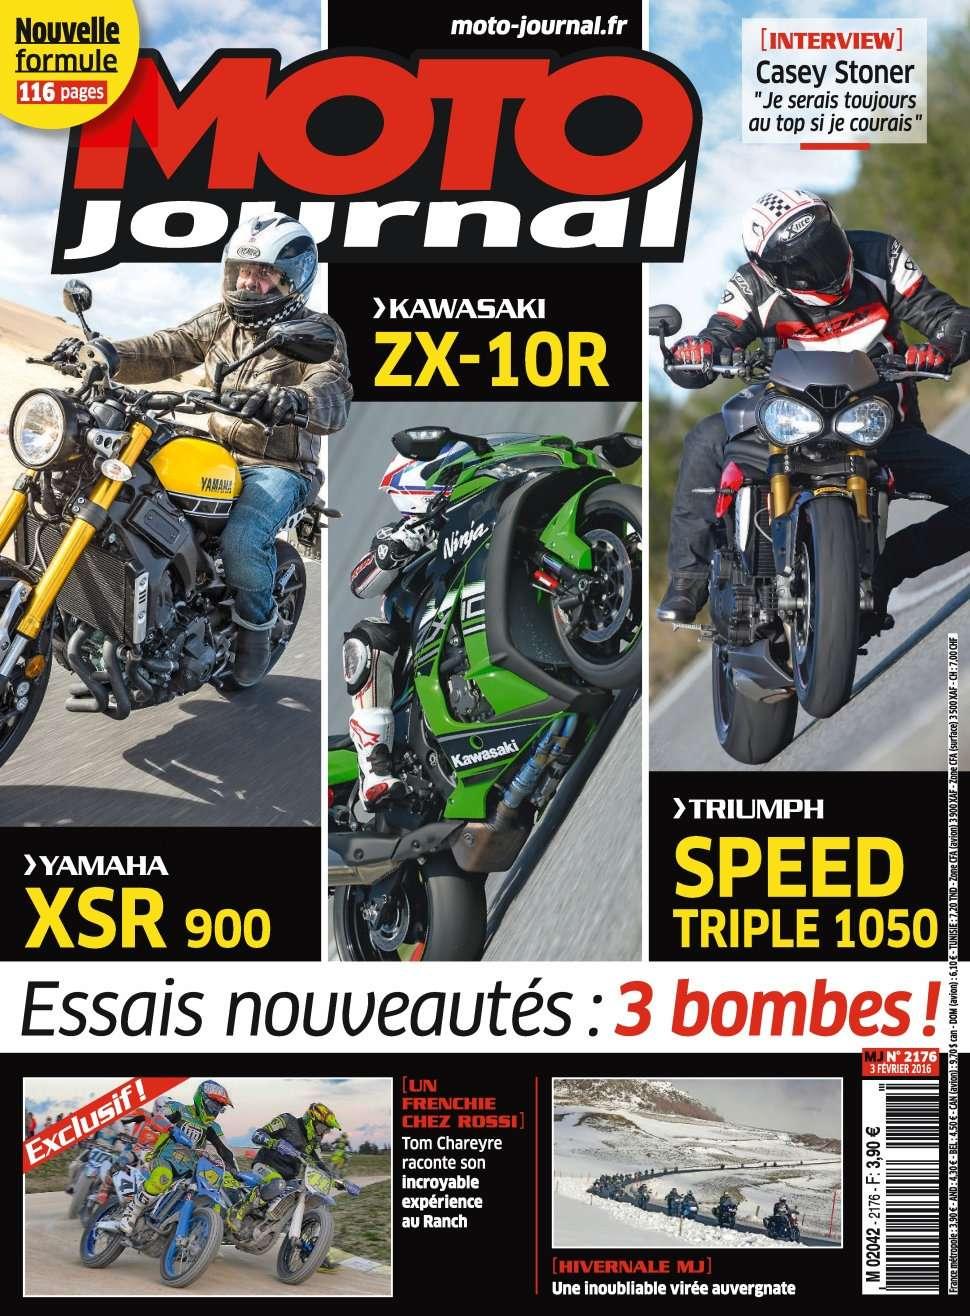 Moto Journal 2176 - 03 Février 2016